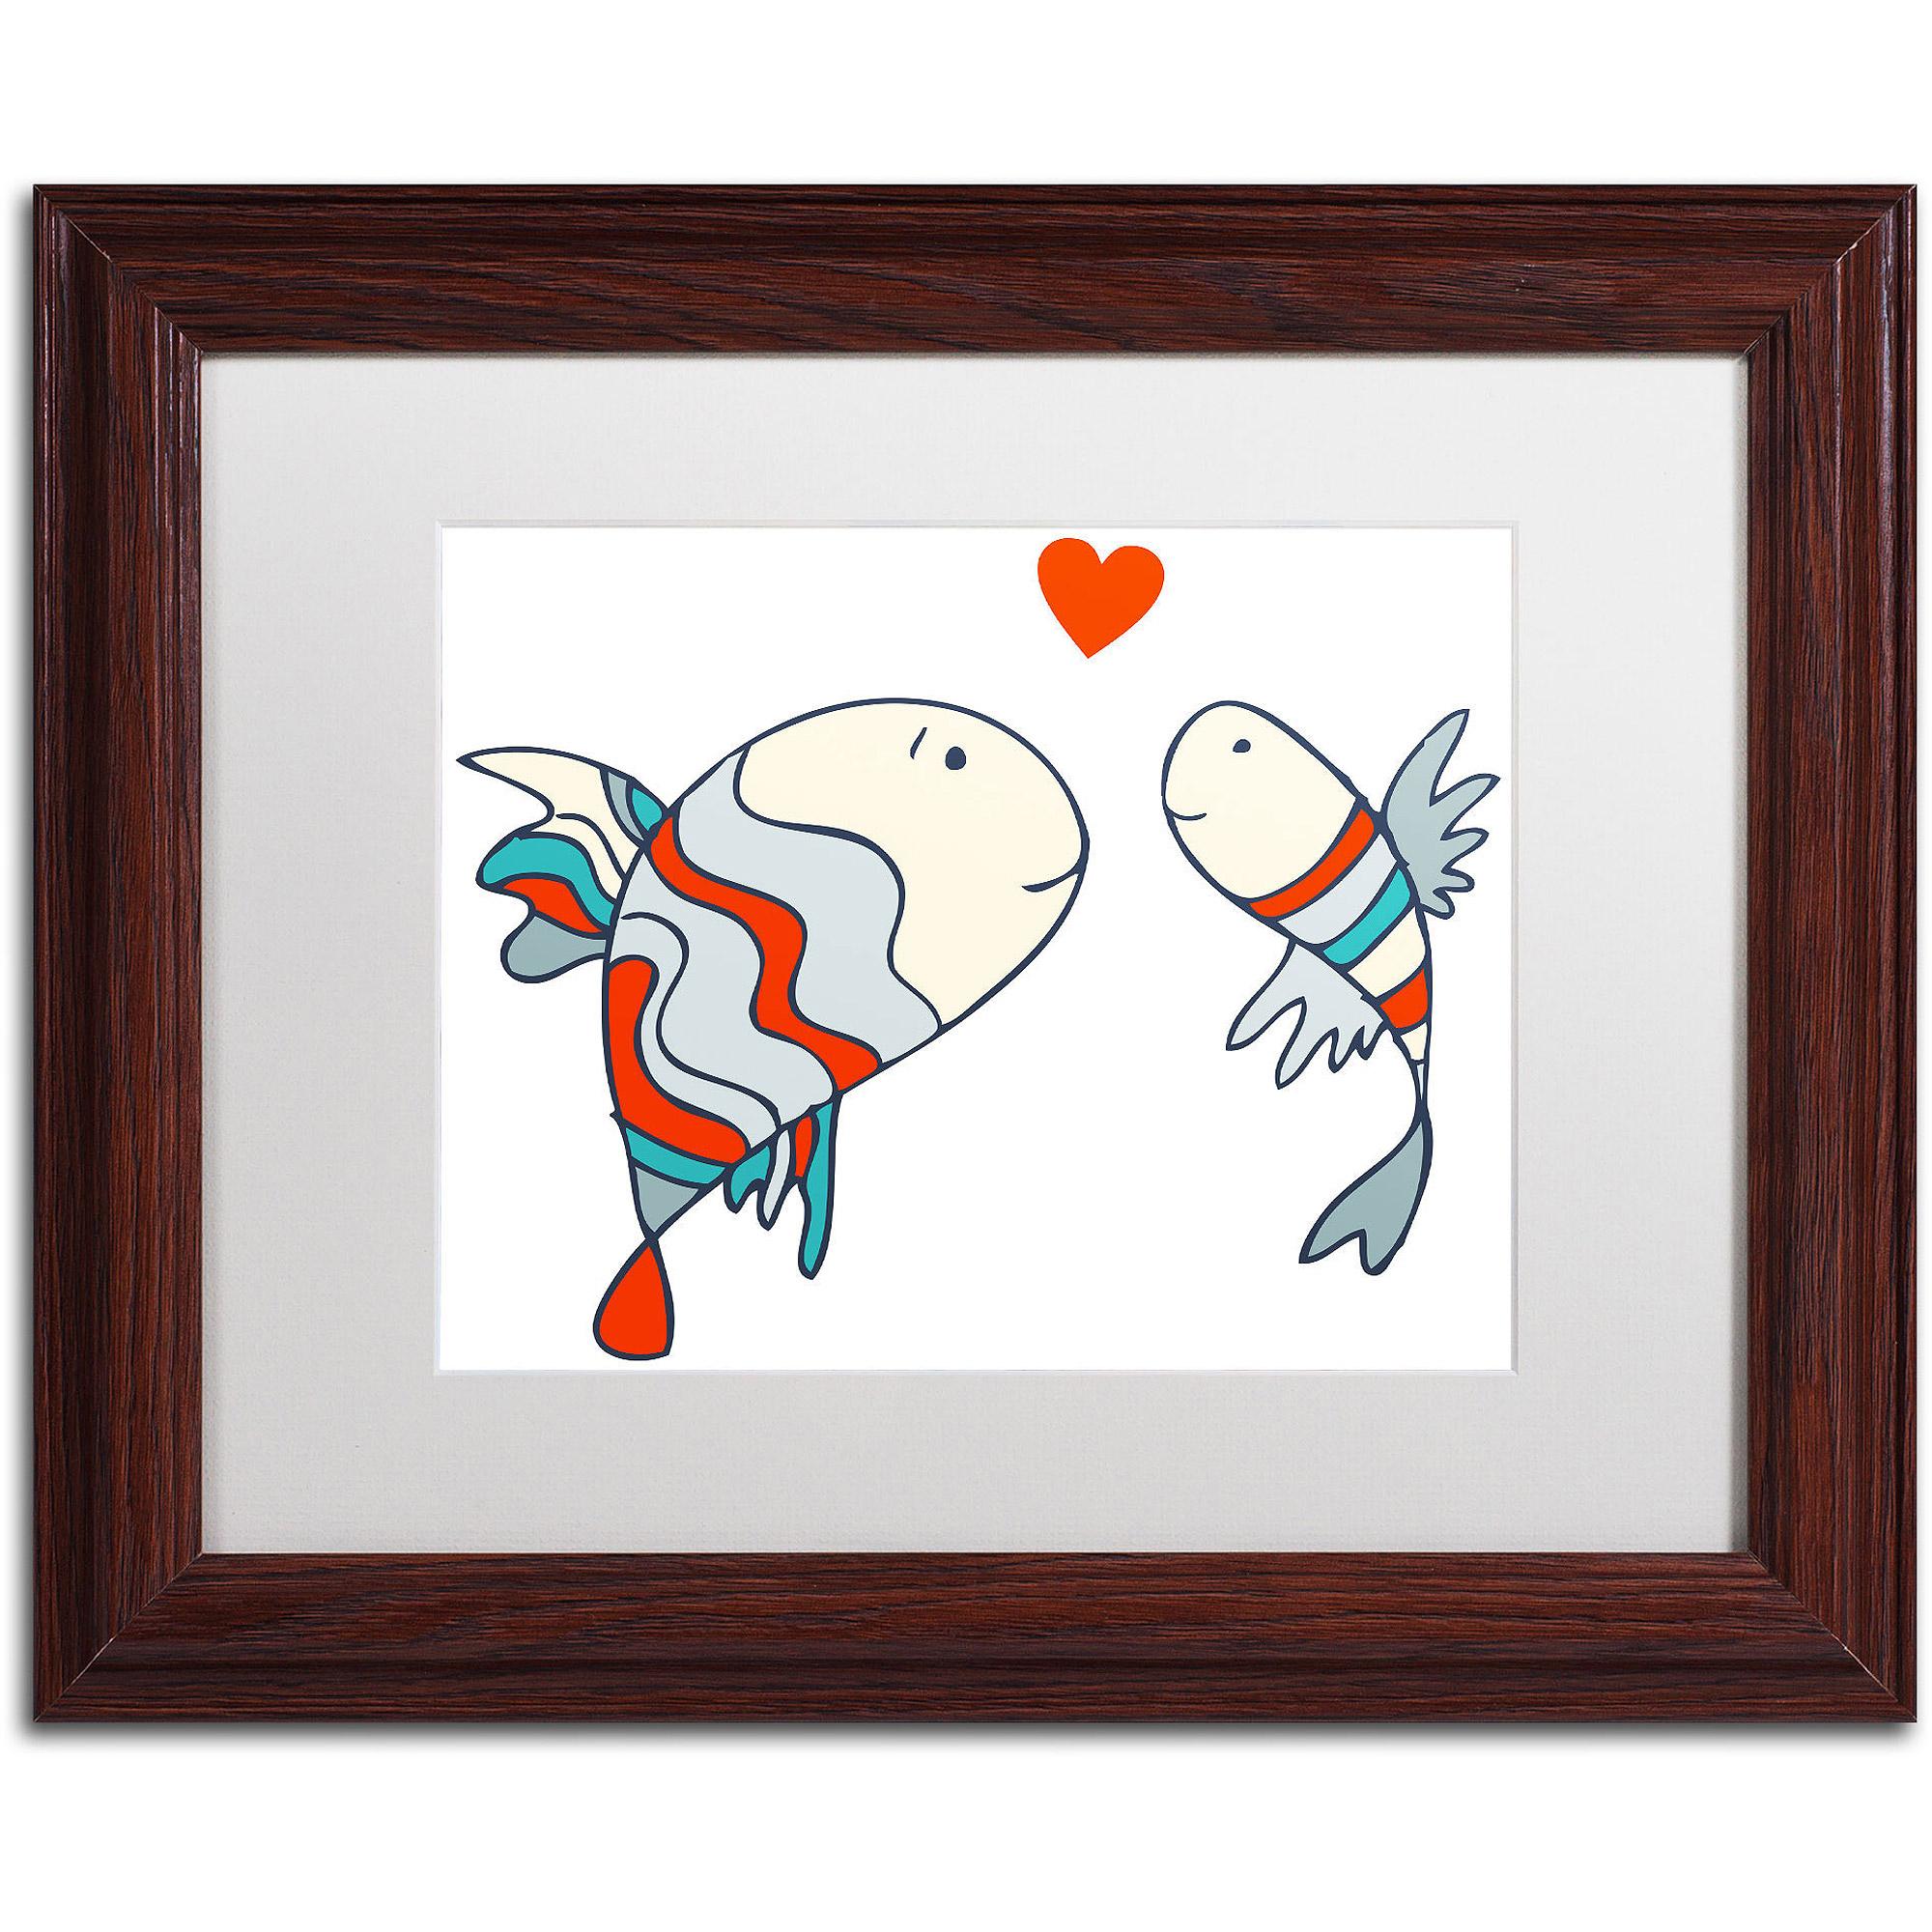 "Trademark Fine Art ""Two Little Fish"" Canvas Art by Carla Martell, White Matte, Wood Frame"